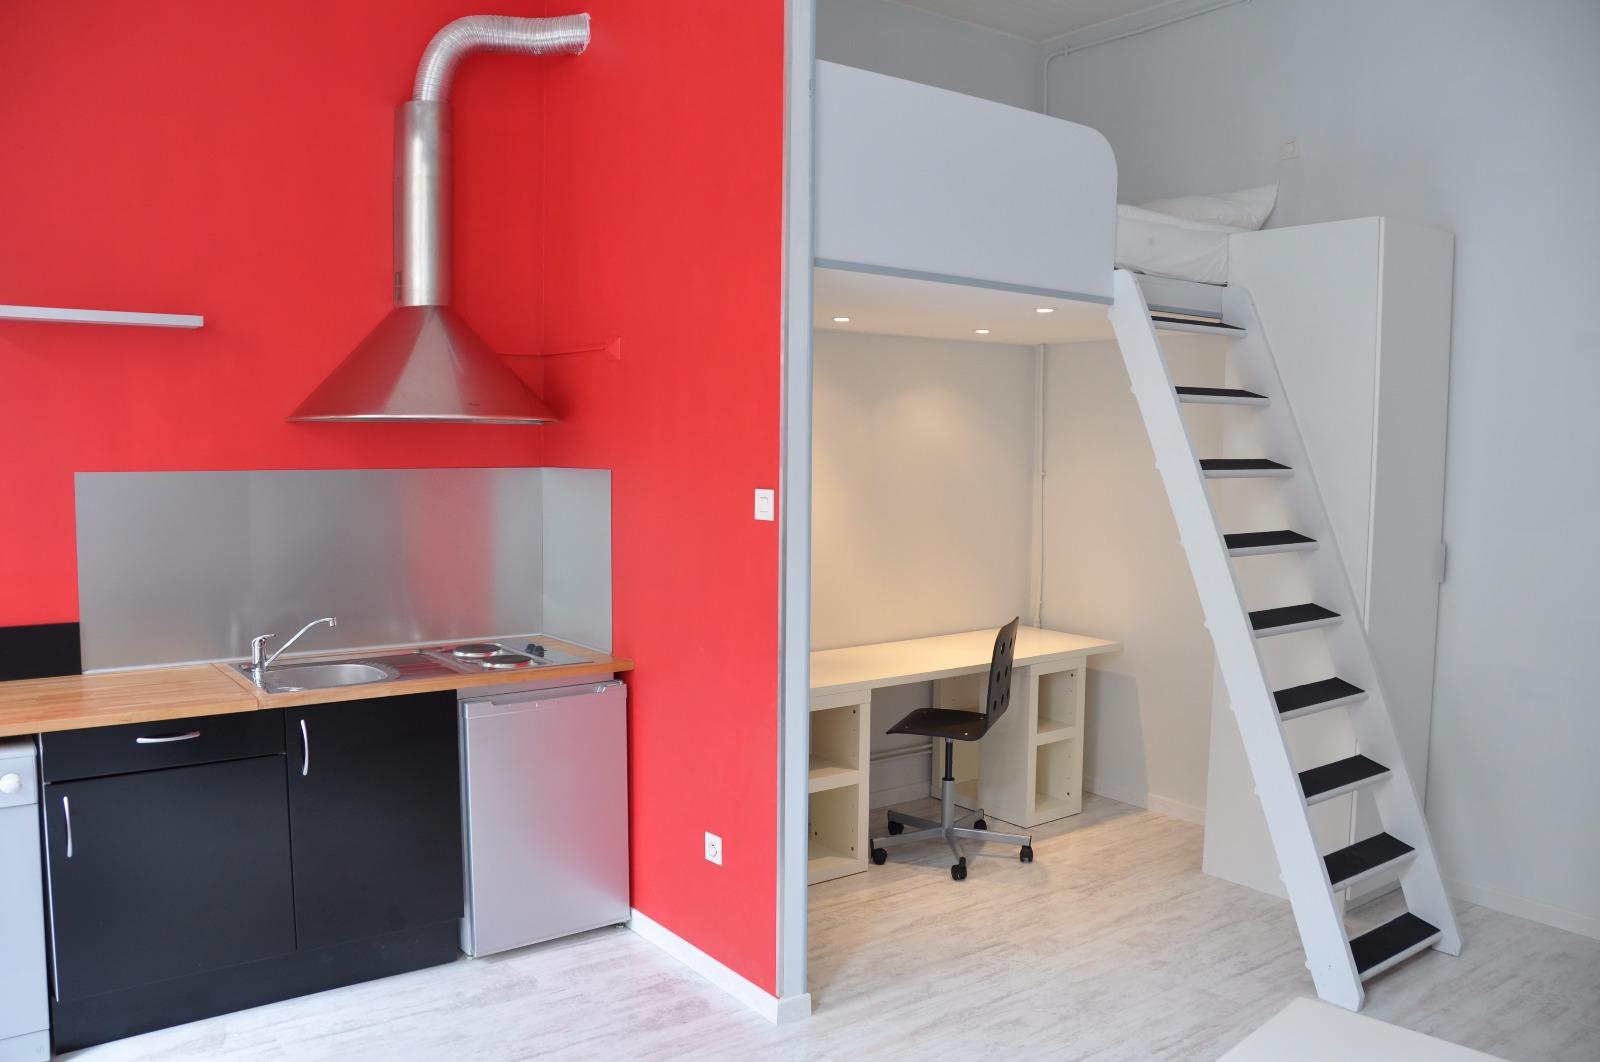 Location appartement avignon 84000 32m avec 1 pi ce s - Location appartement meuble avignon ...